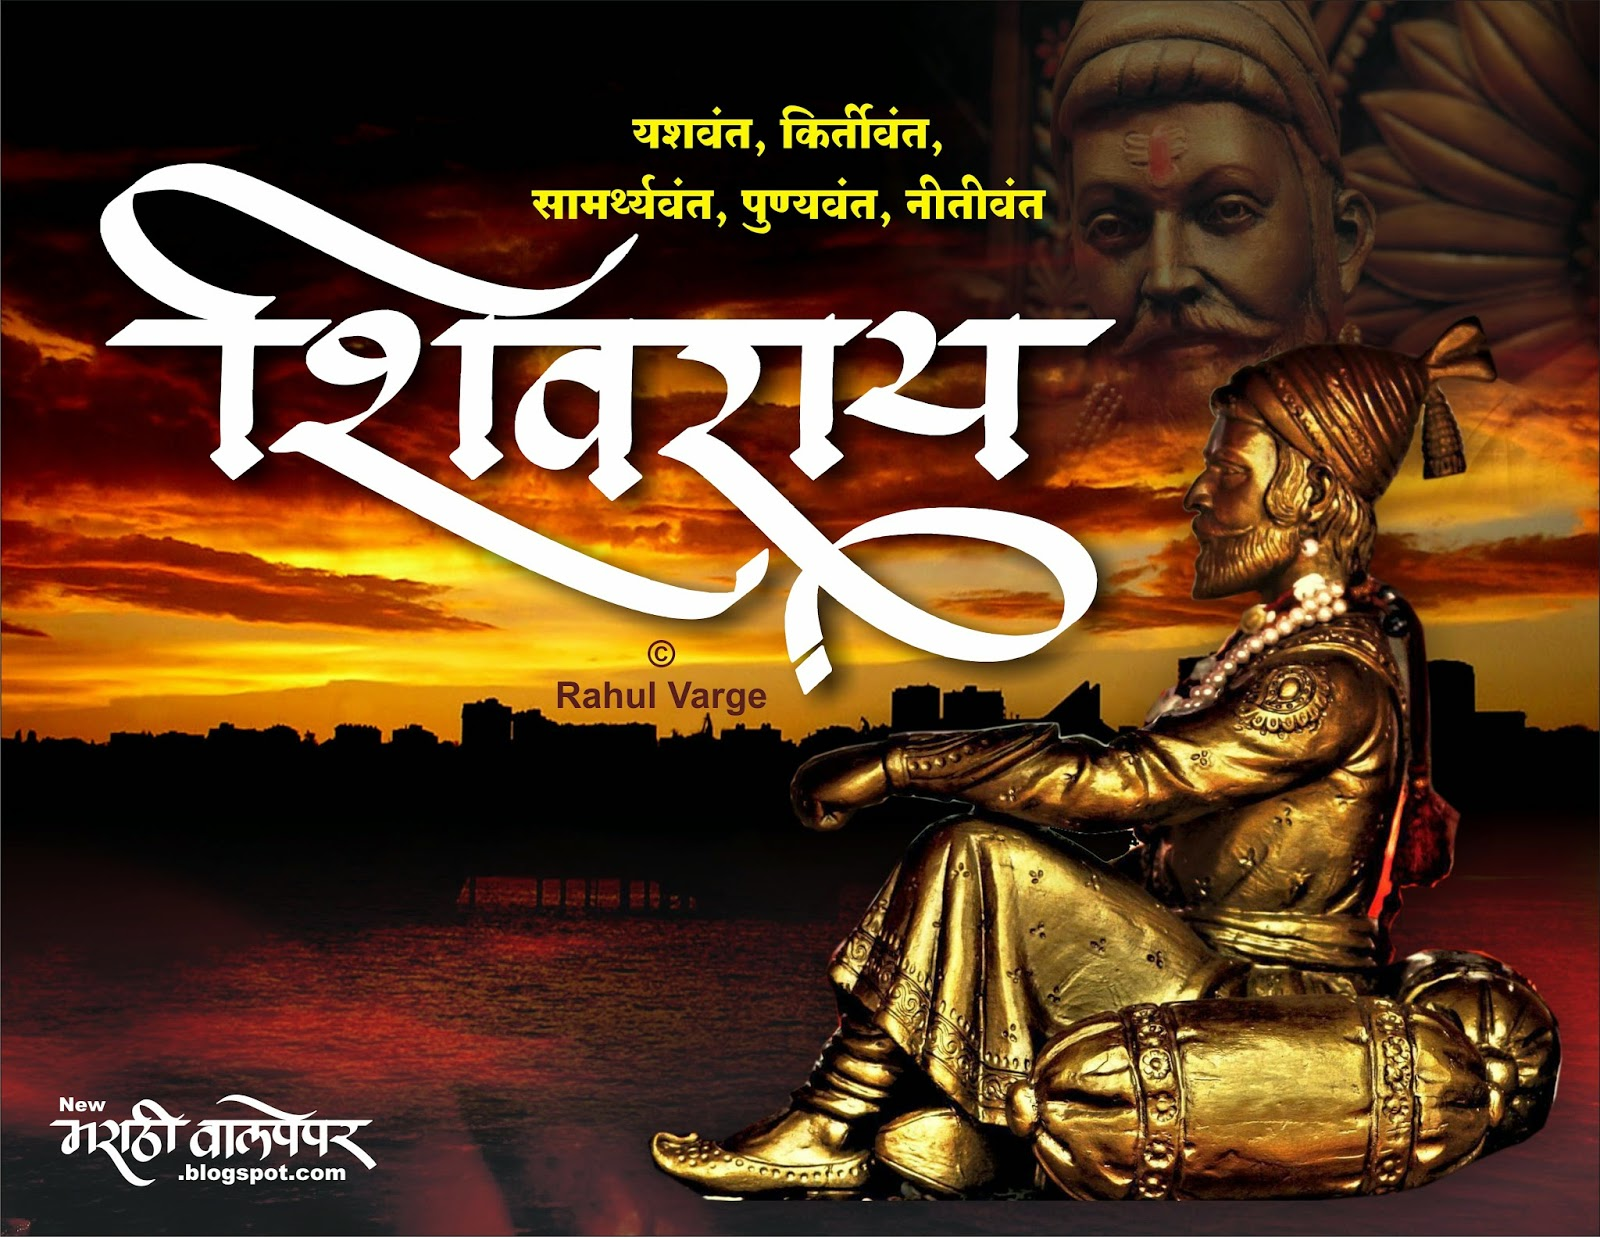 Shivray + Shivaji Maharaj HD + New Marathi Wallpaper ...